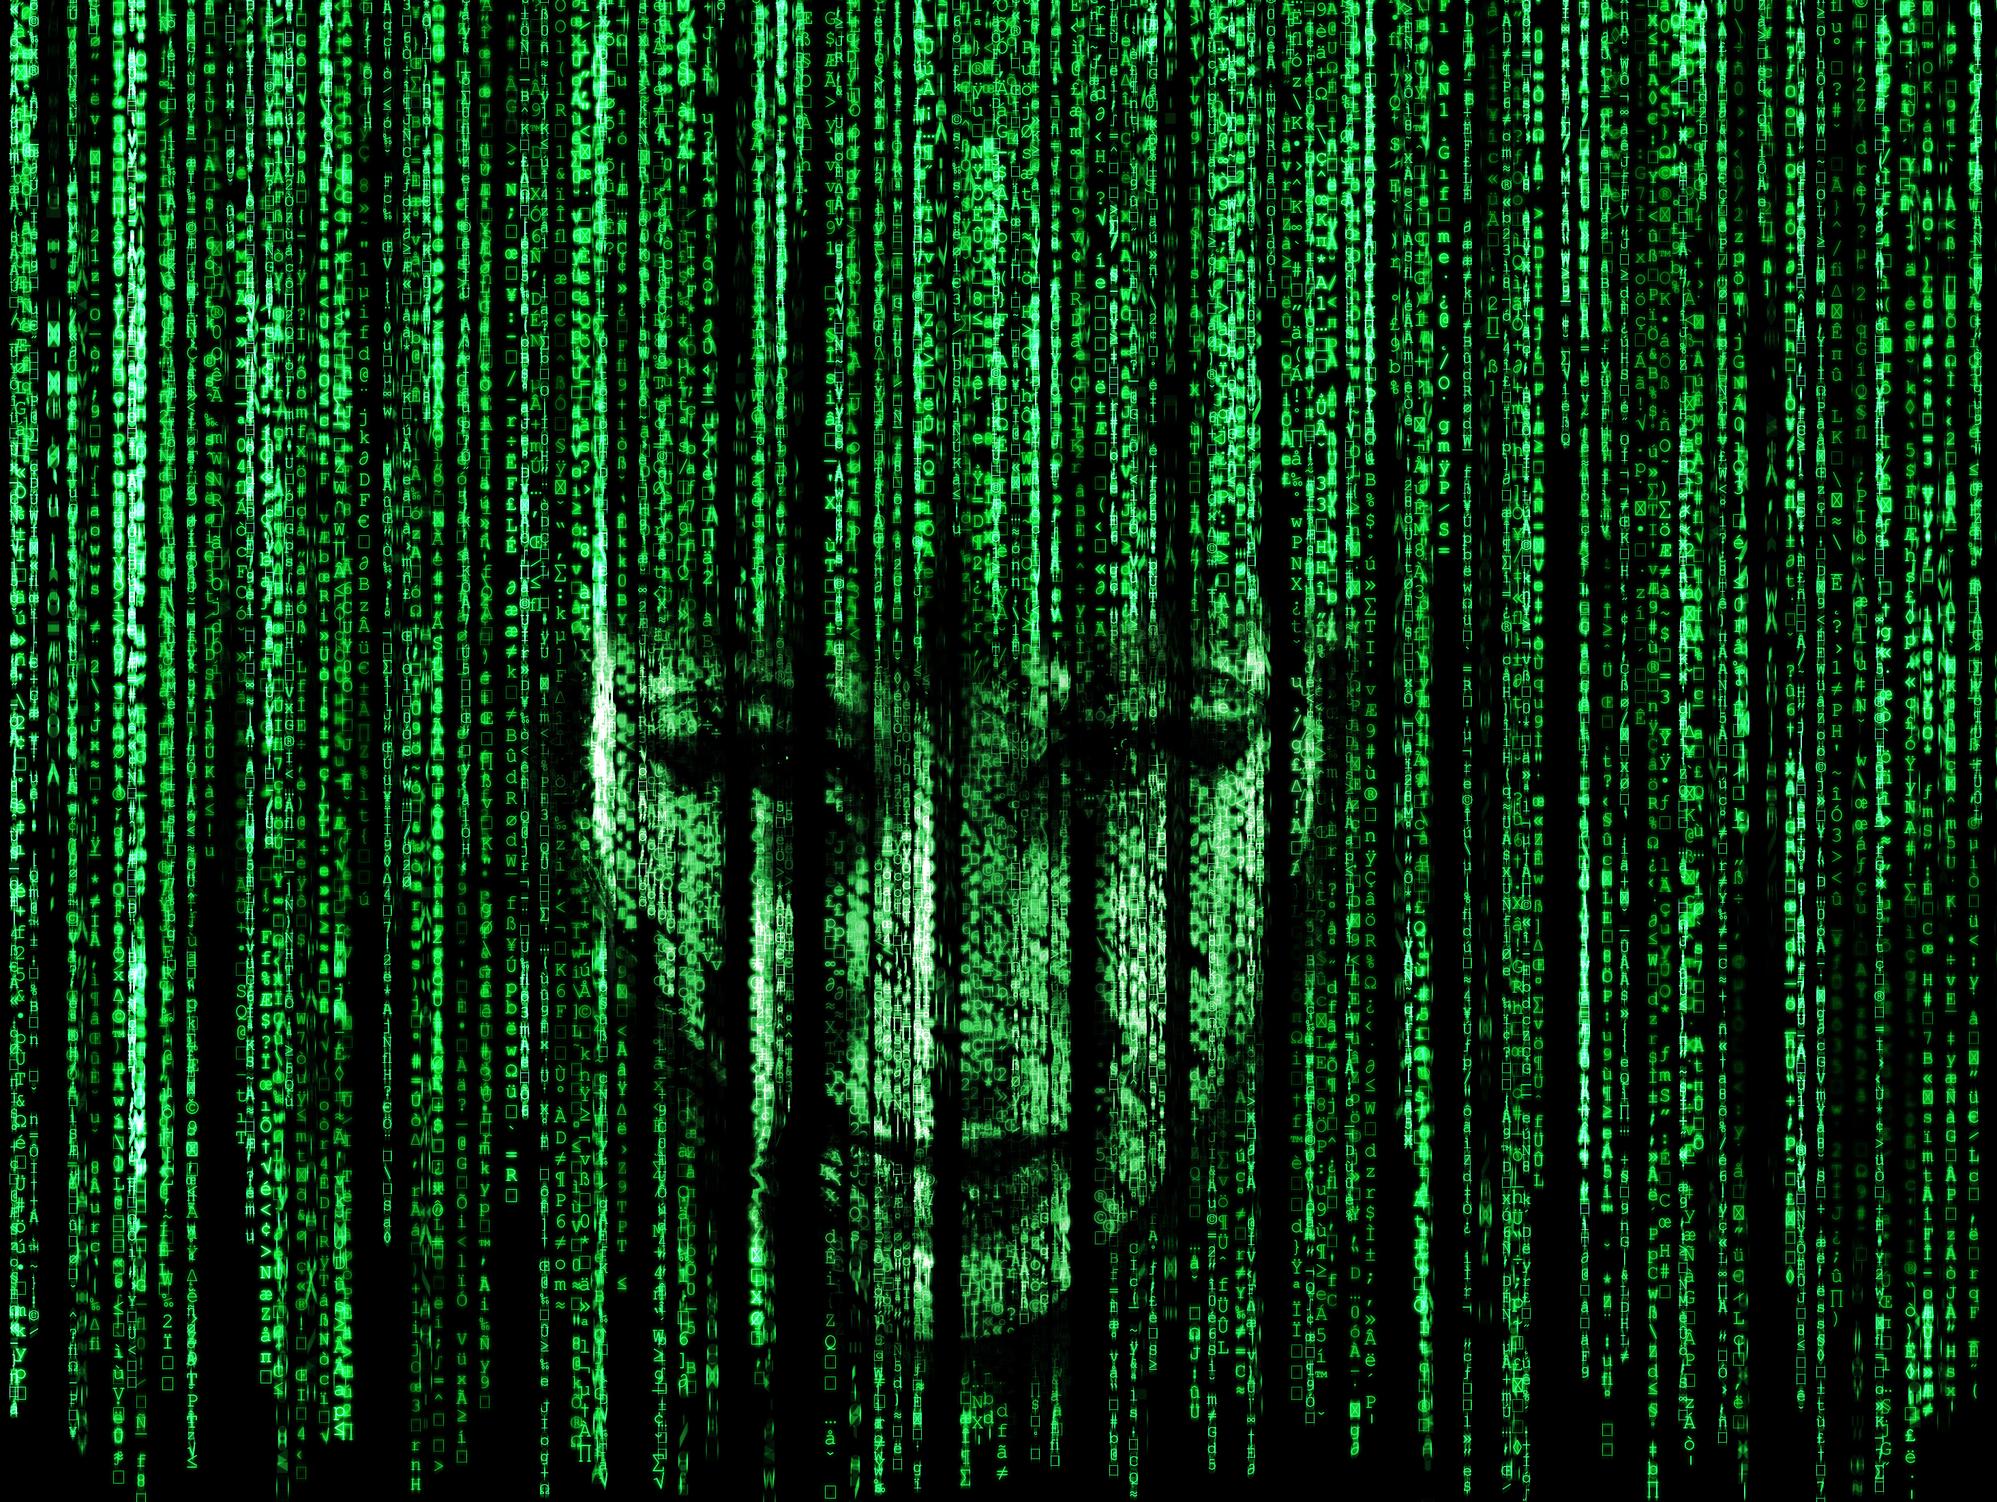 Matrix Falling Code Wallpaper Terminator Robots And Ai Risk Huffpost